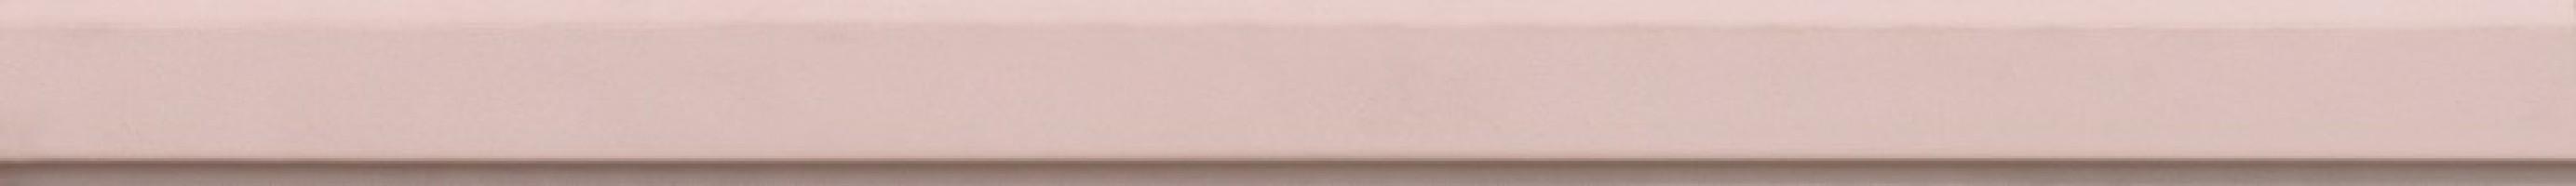 Бордюр Marca Corona Victoria Blush List 3x40 I004